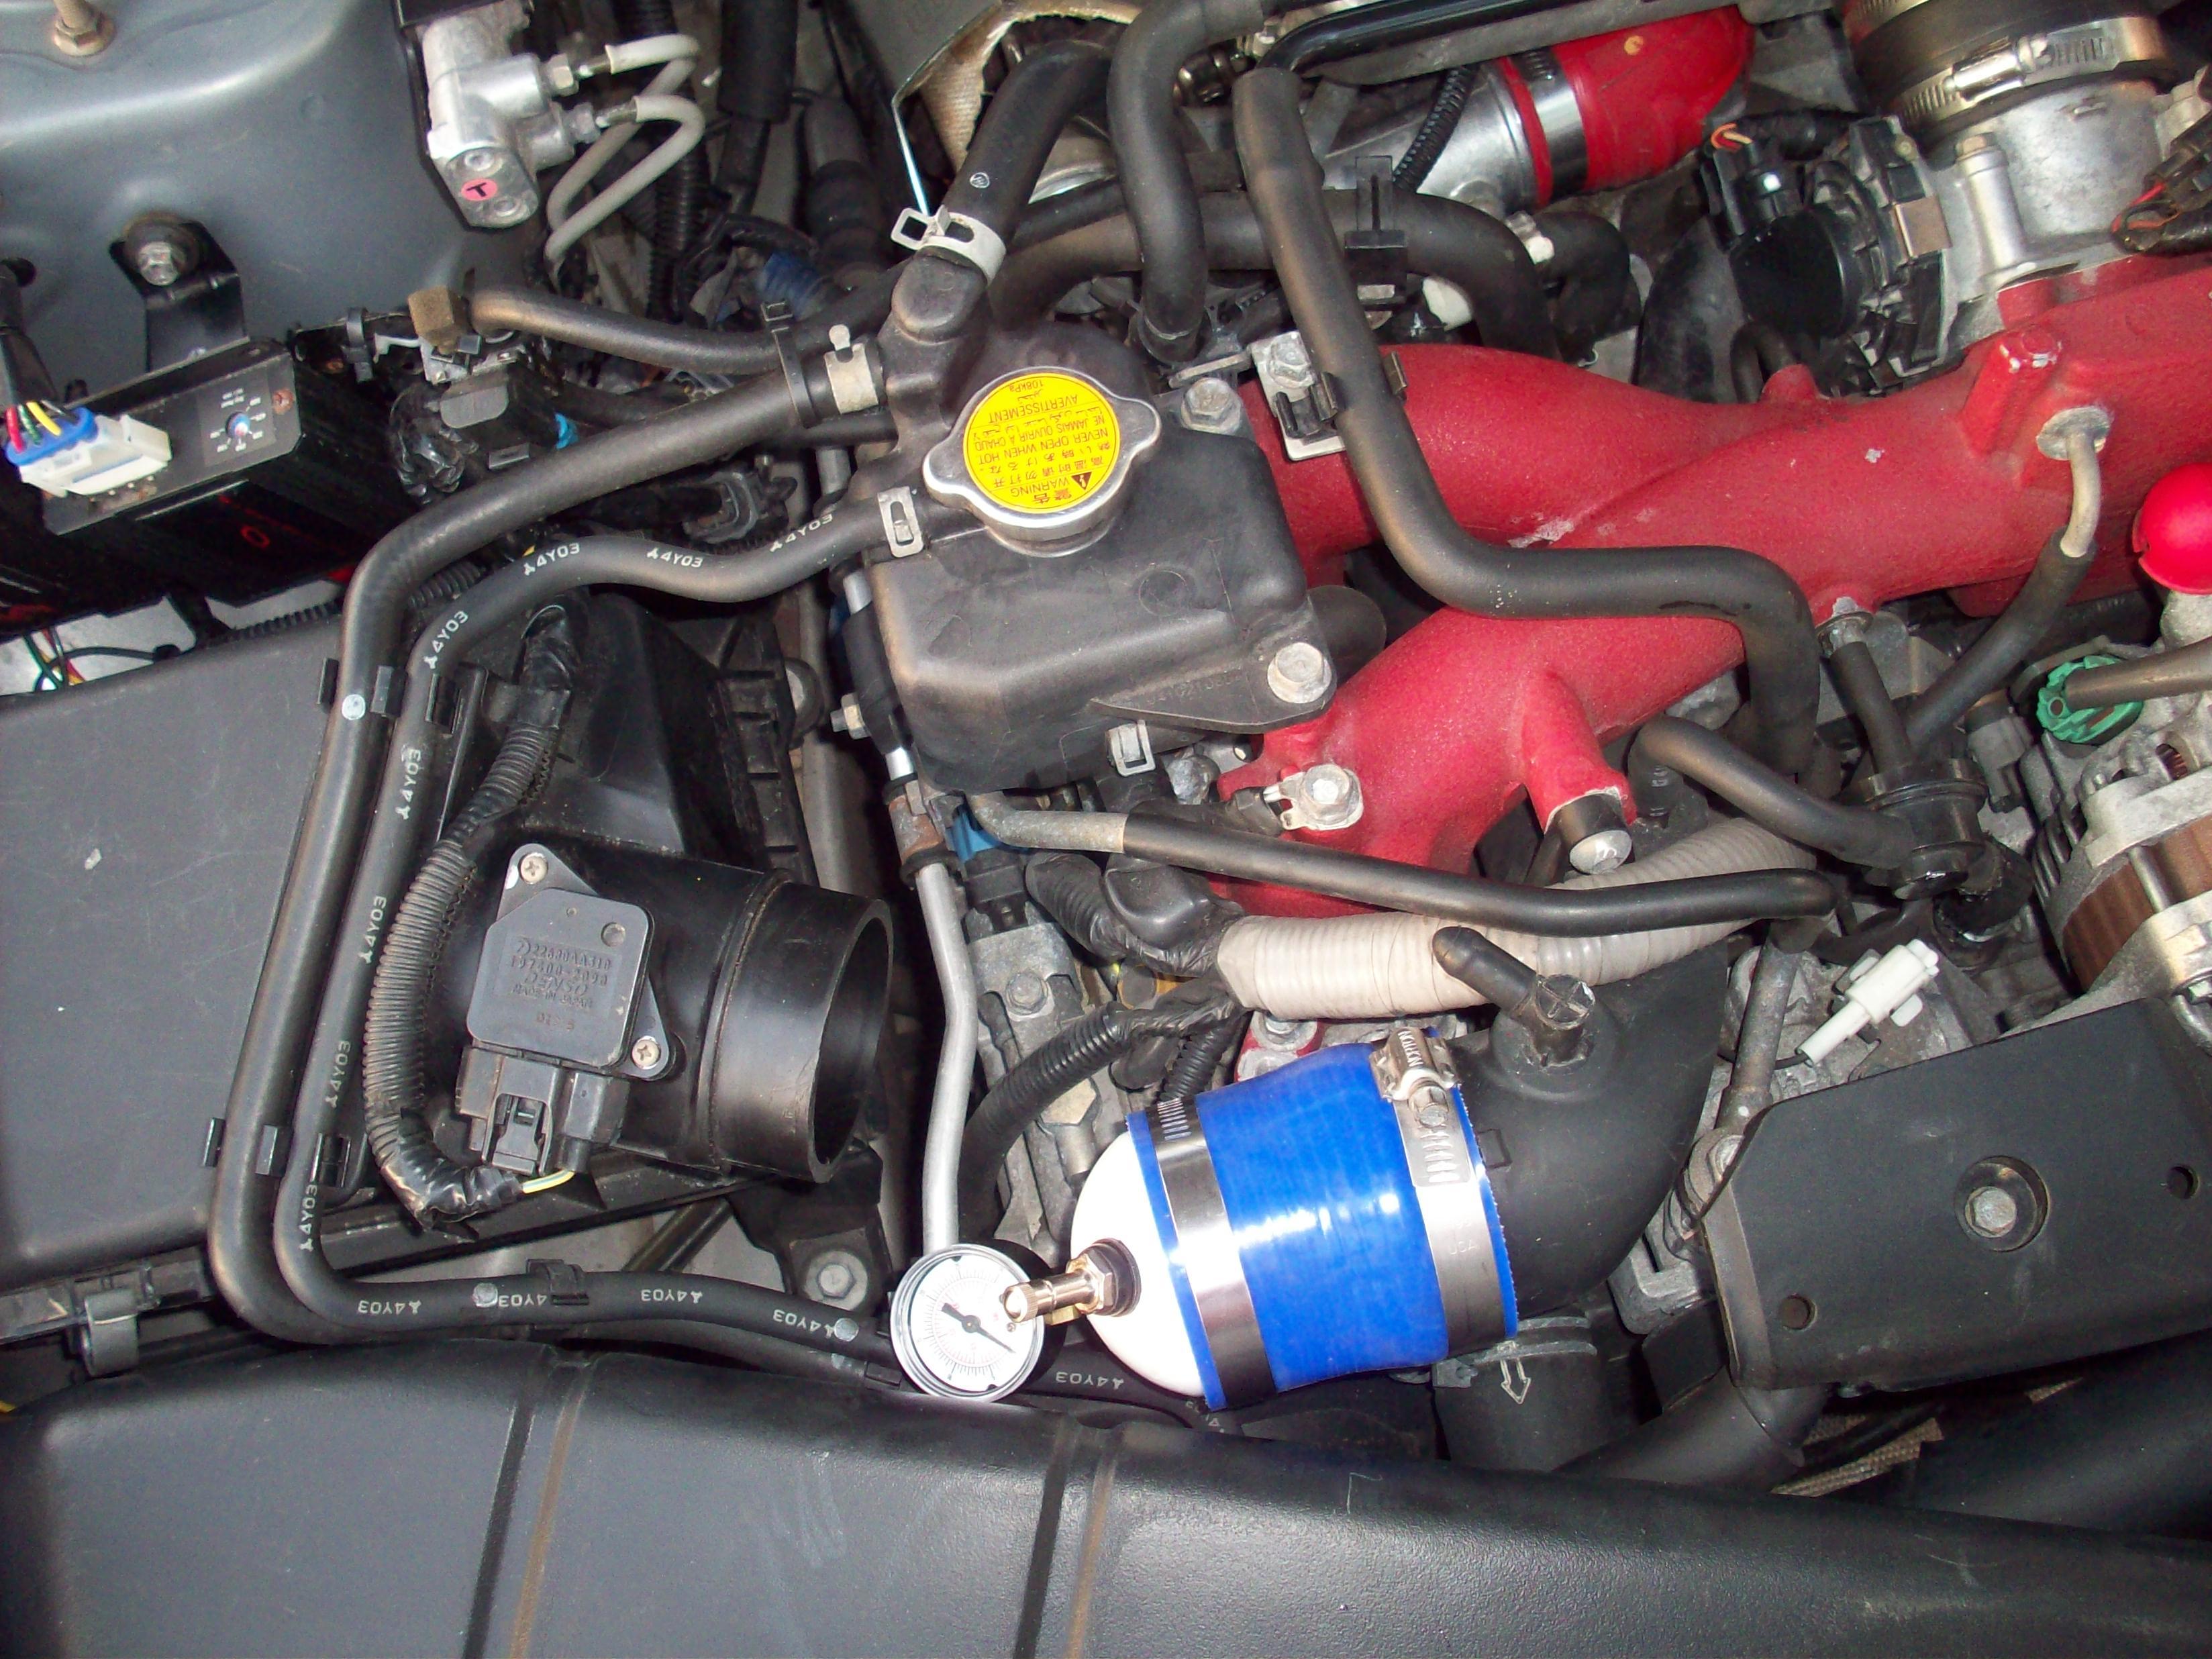 small resolution of 1998 subaru forester engine diagram subaru forester 2005 engine coolant 2000 subaru forester engine diagram 2004